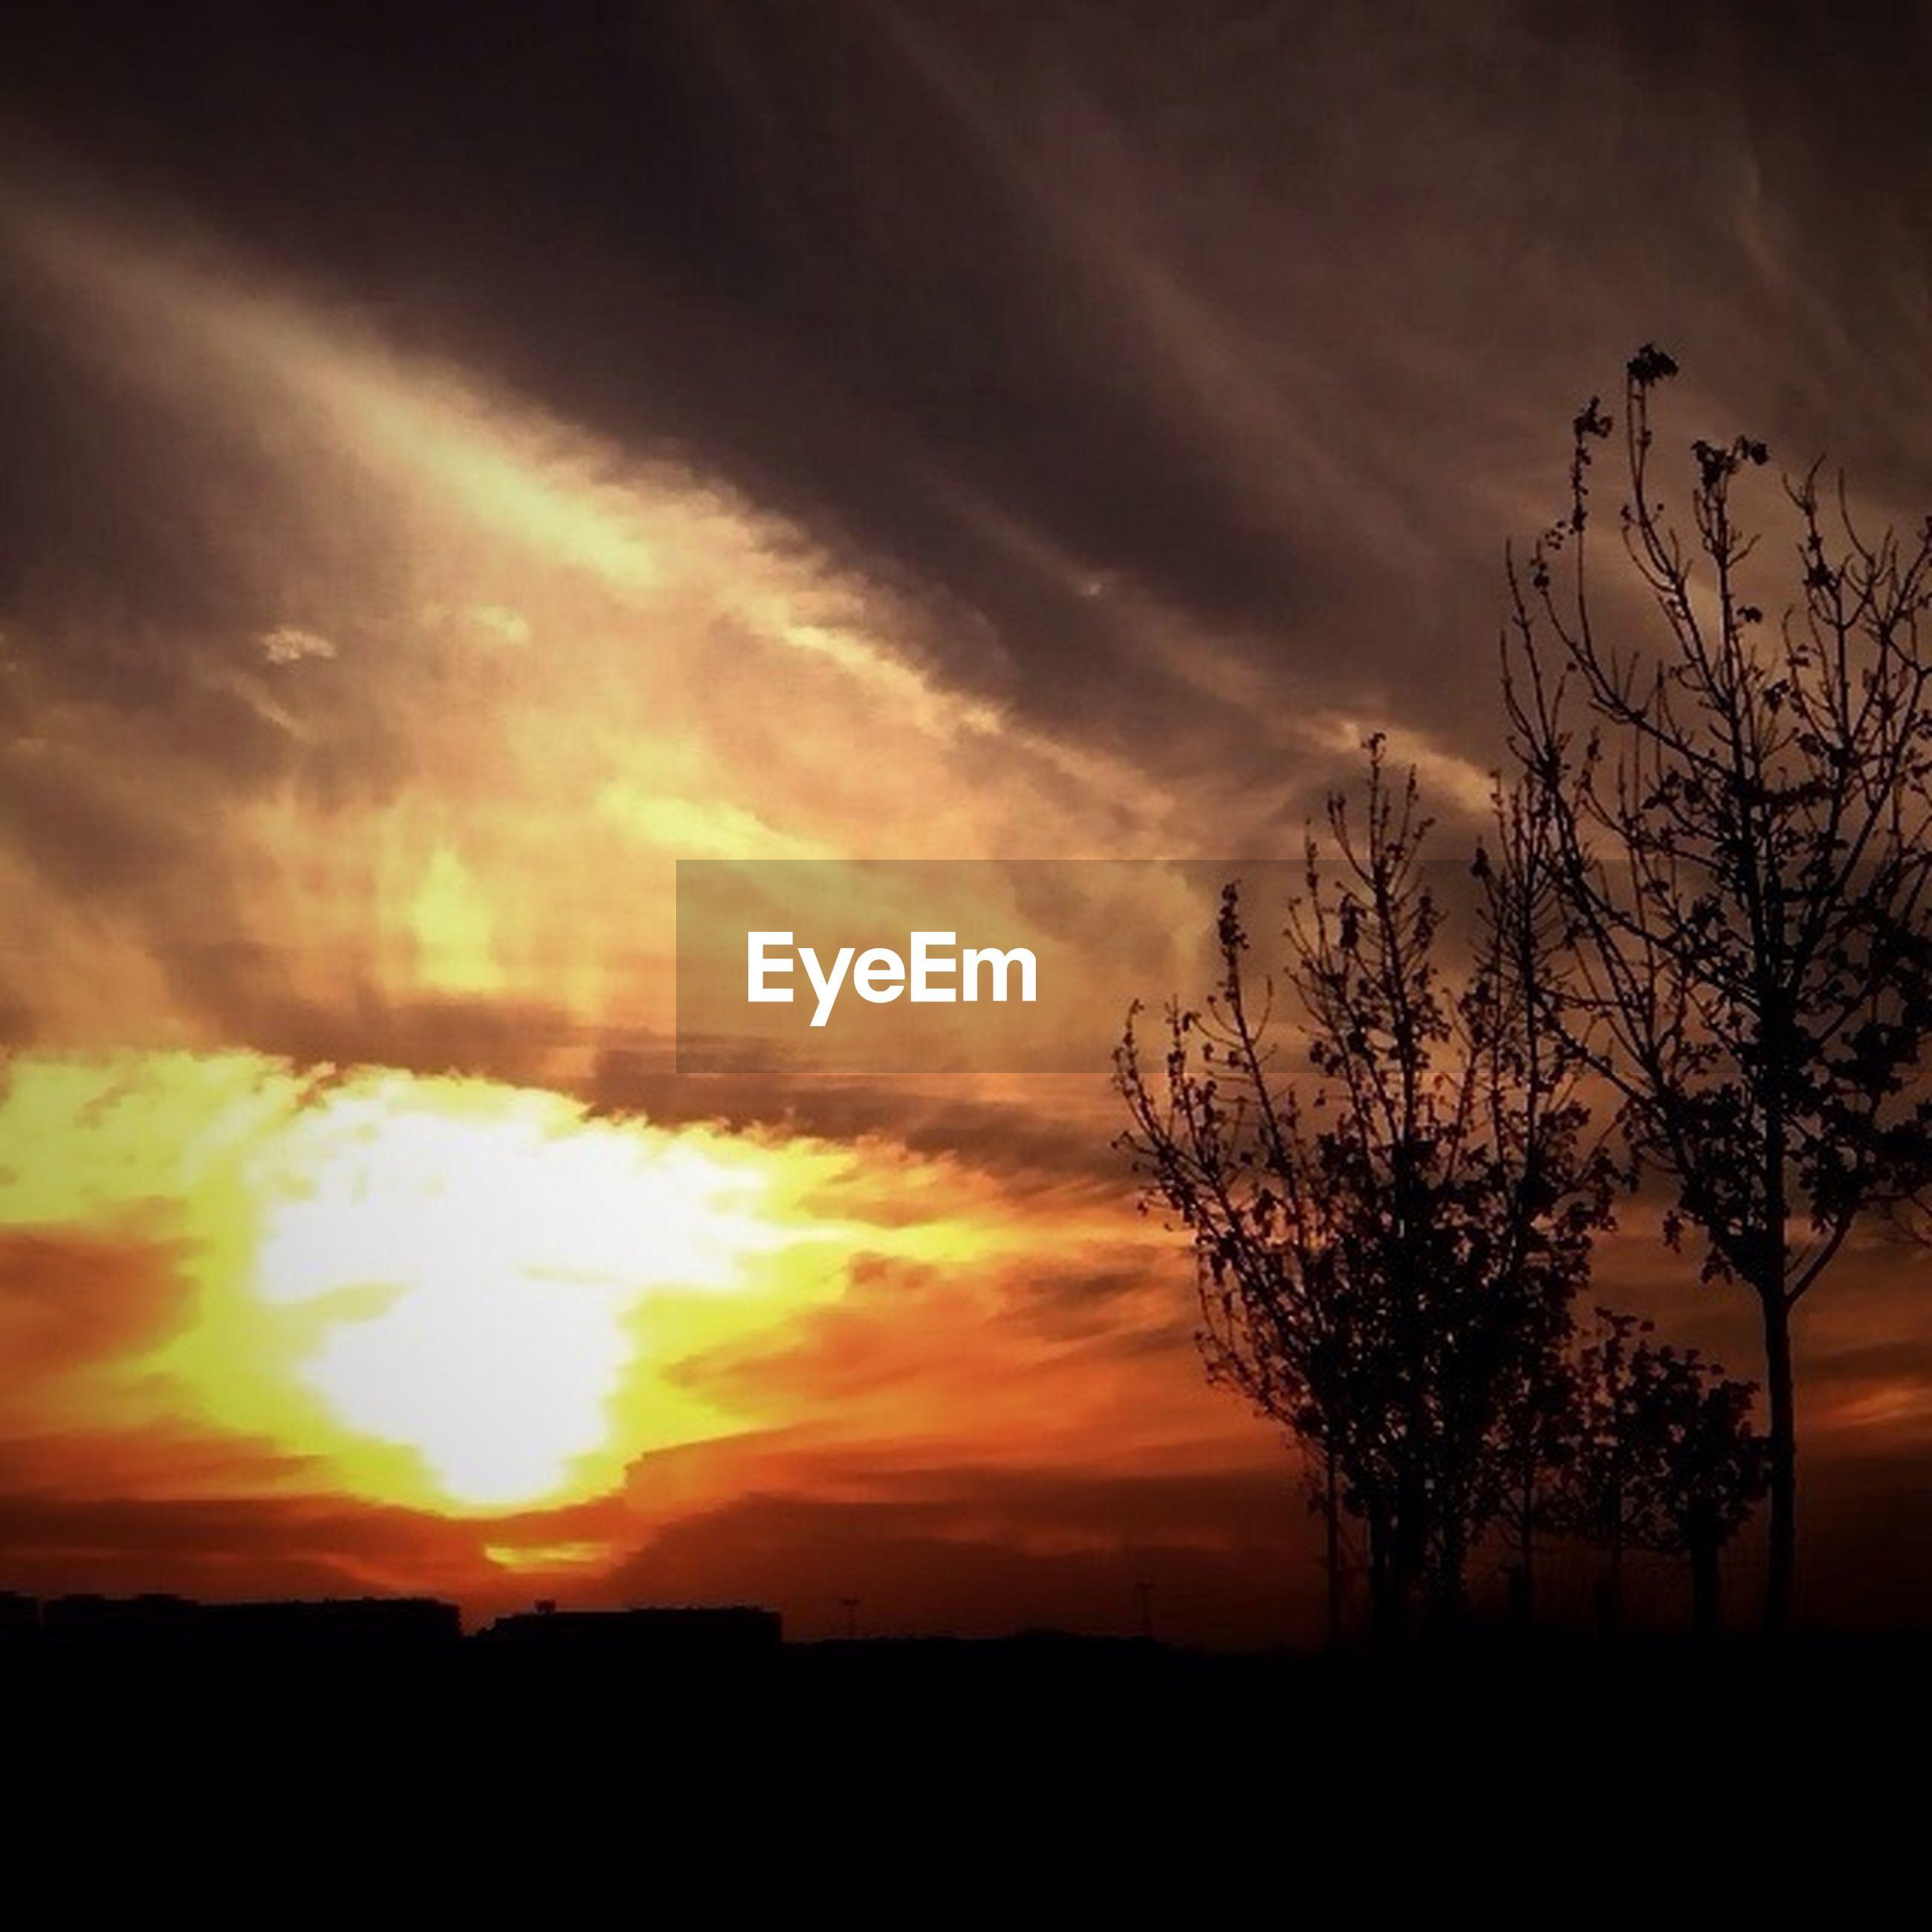 sunset, silhouette, scenics, sky, tranquil scene, tranquility, beauty in nature, orange color, tree, nature, landscape, cloud - sky, idyllic, dramatic sky, cloud, dark, sun, outdoors, moody sky, no people